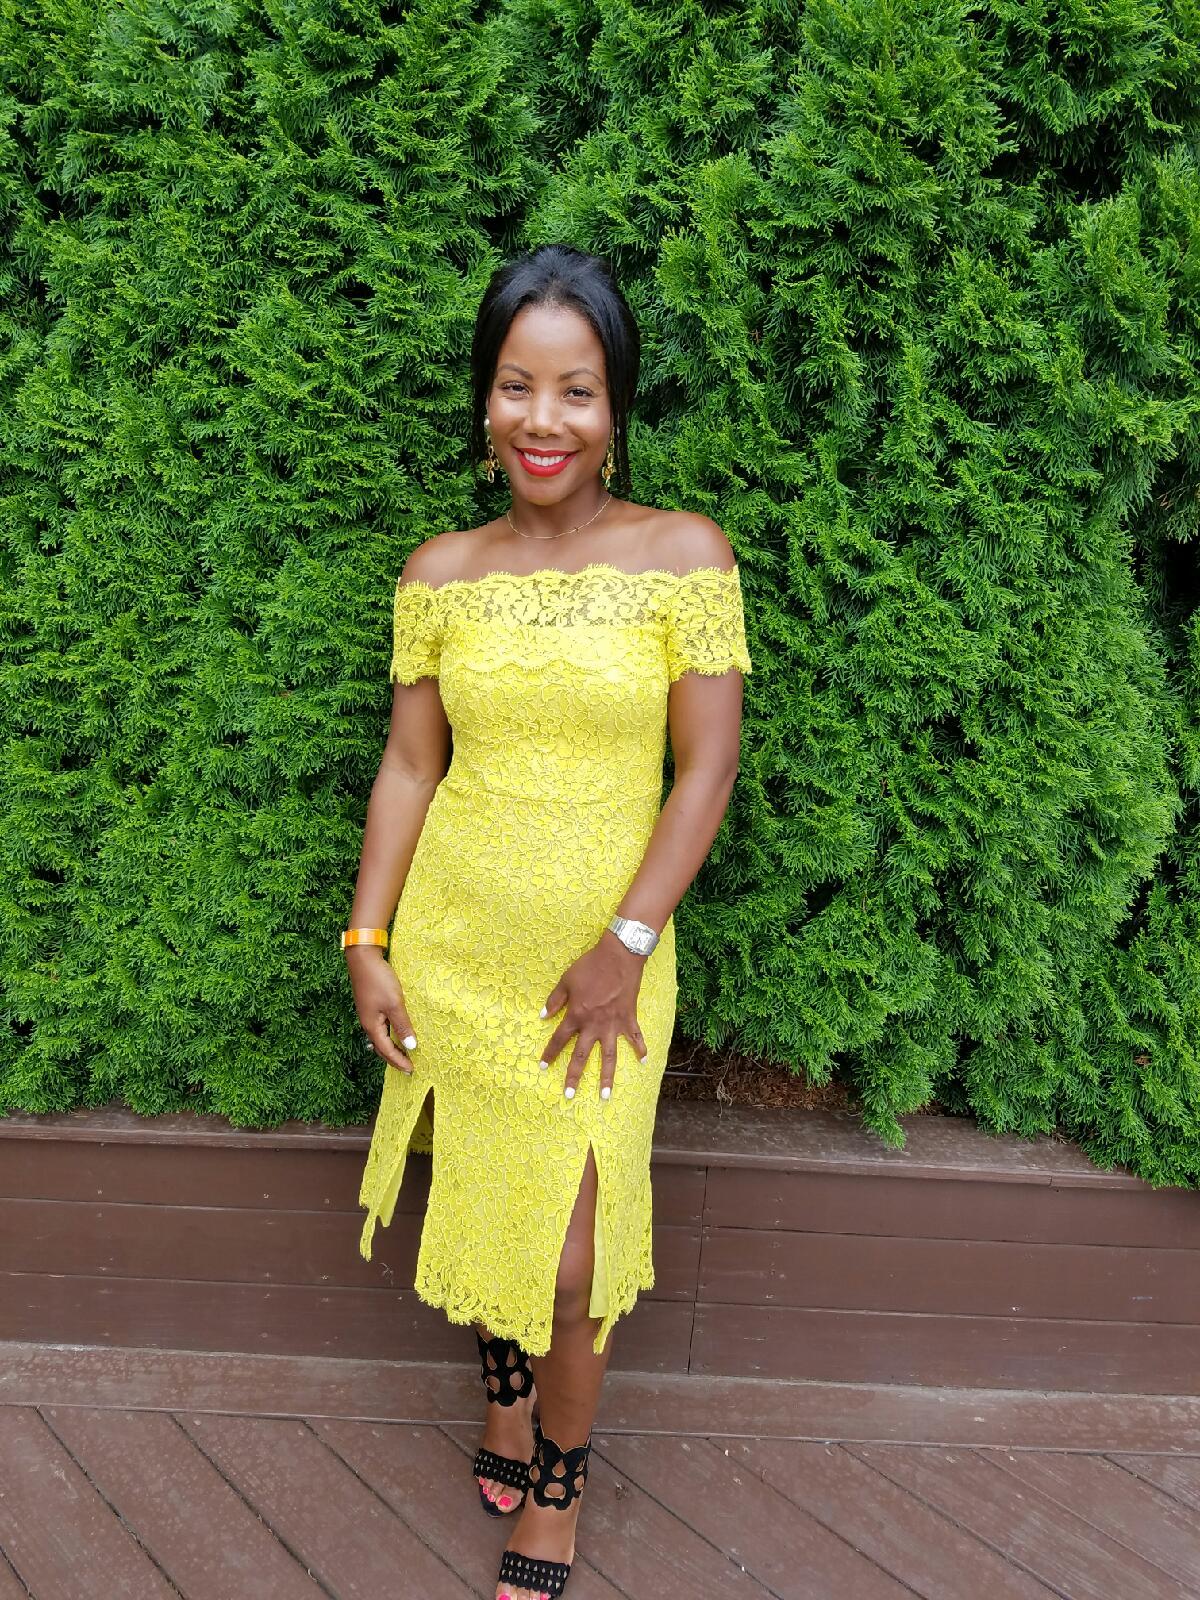 Rosie Yellow Dress